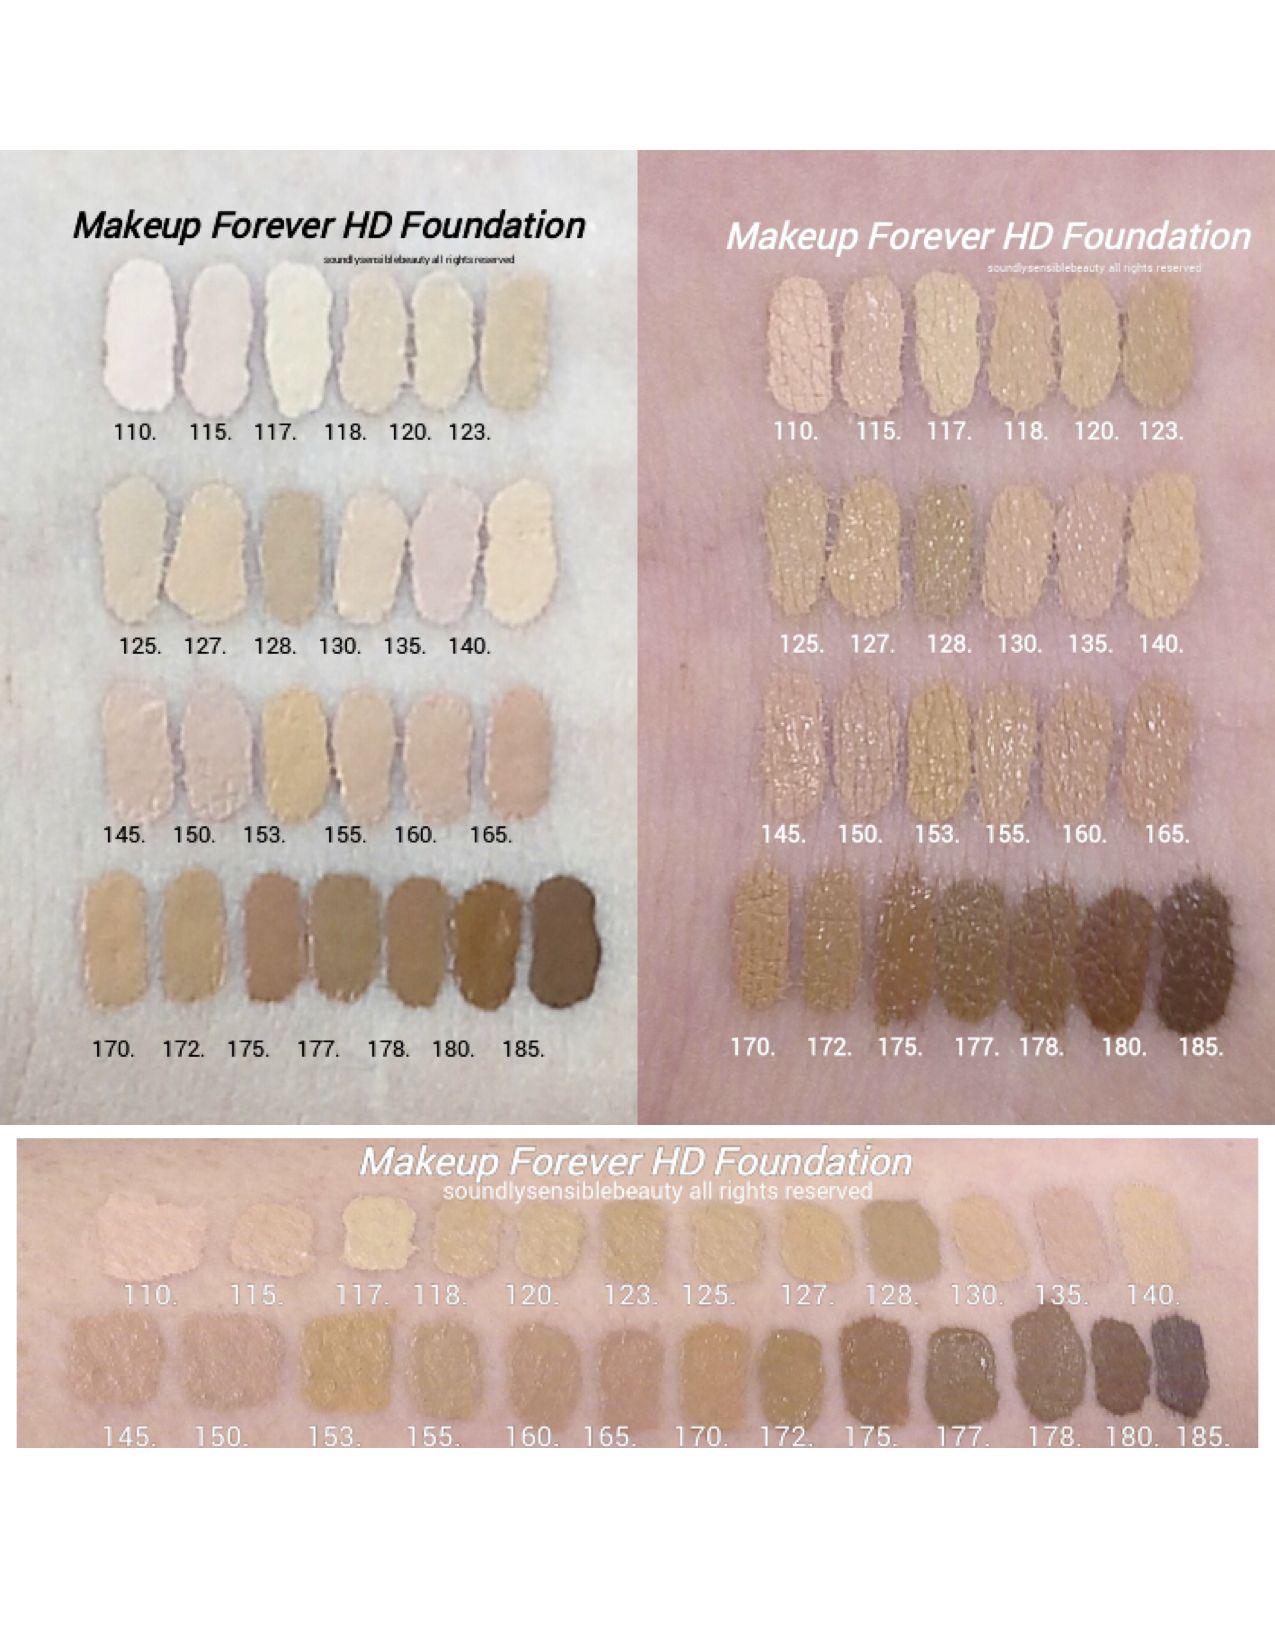 reactjs how to get foundation reveal